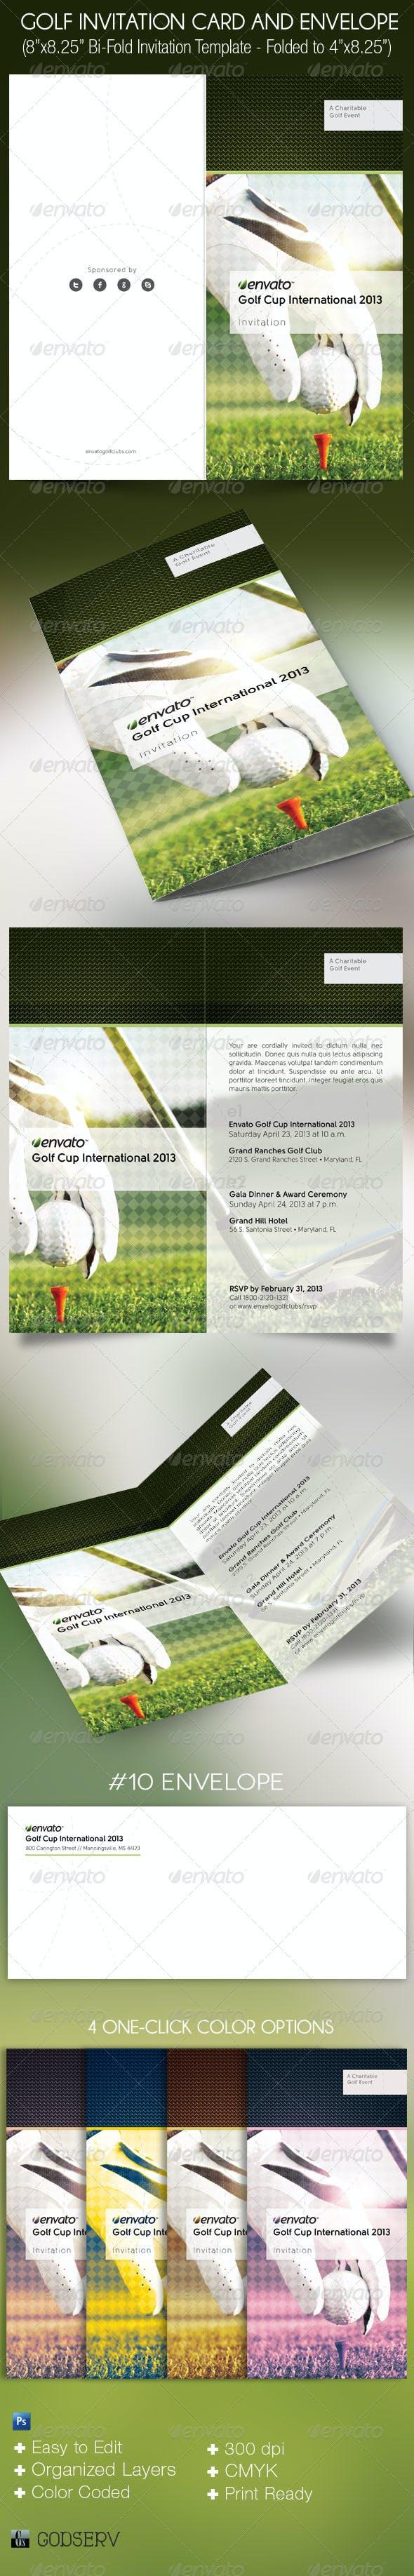 golf invitation card envelope template by godserv graphicriver